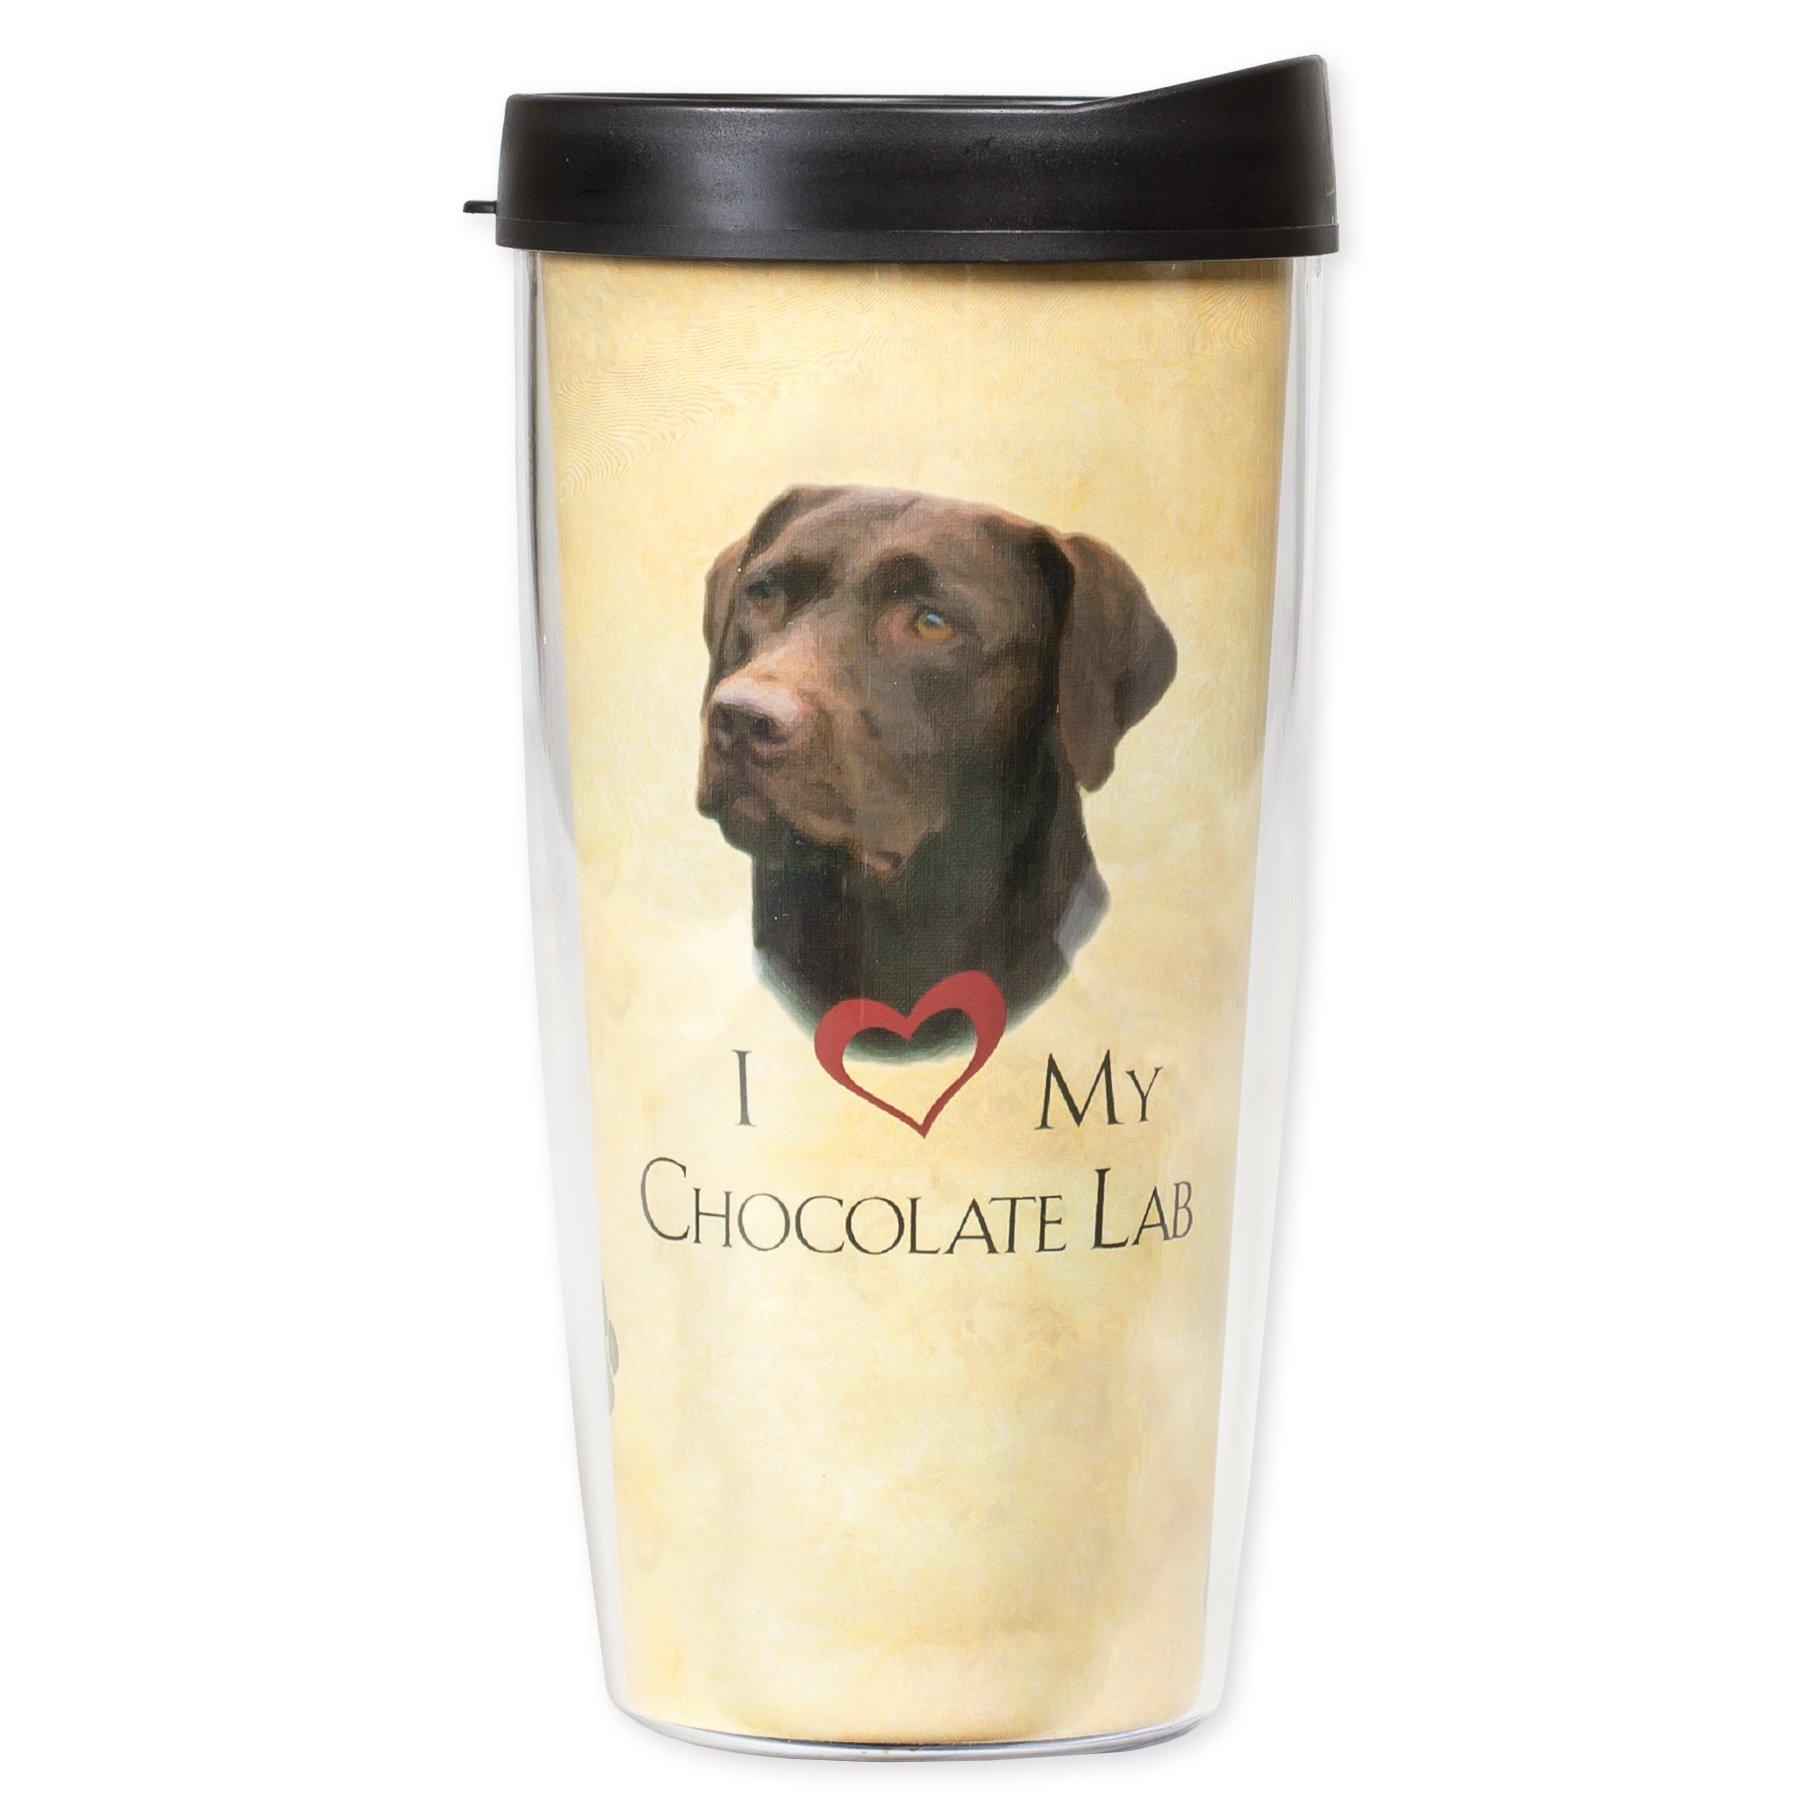 I Love My Chocolate Lab Dog Paws 16 Oz Tumbler Mug with Lid by Signature Tumblers (Image #1)